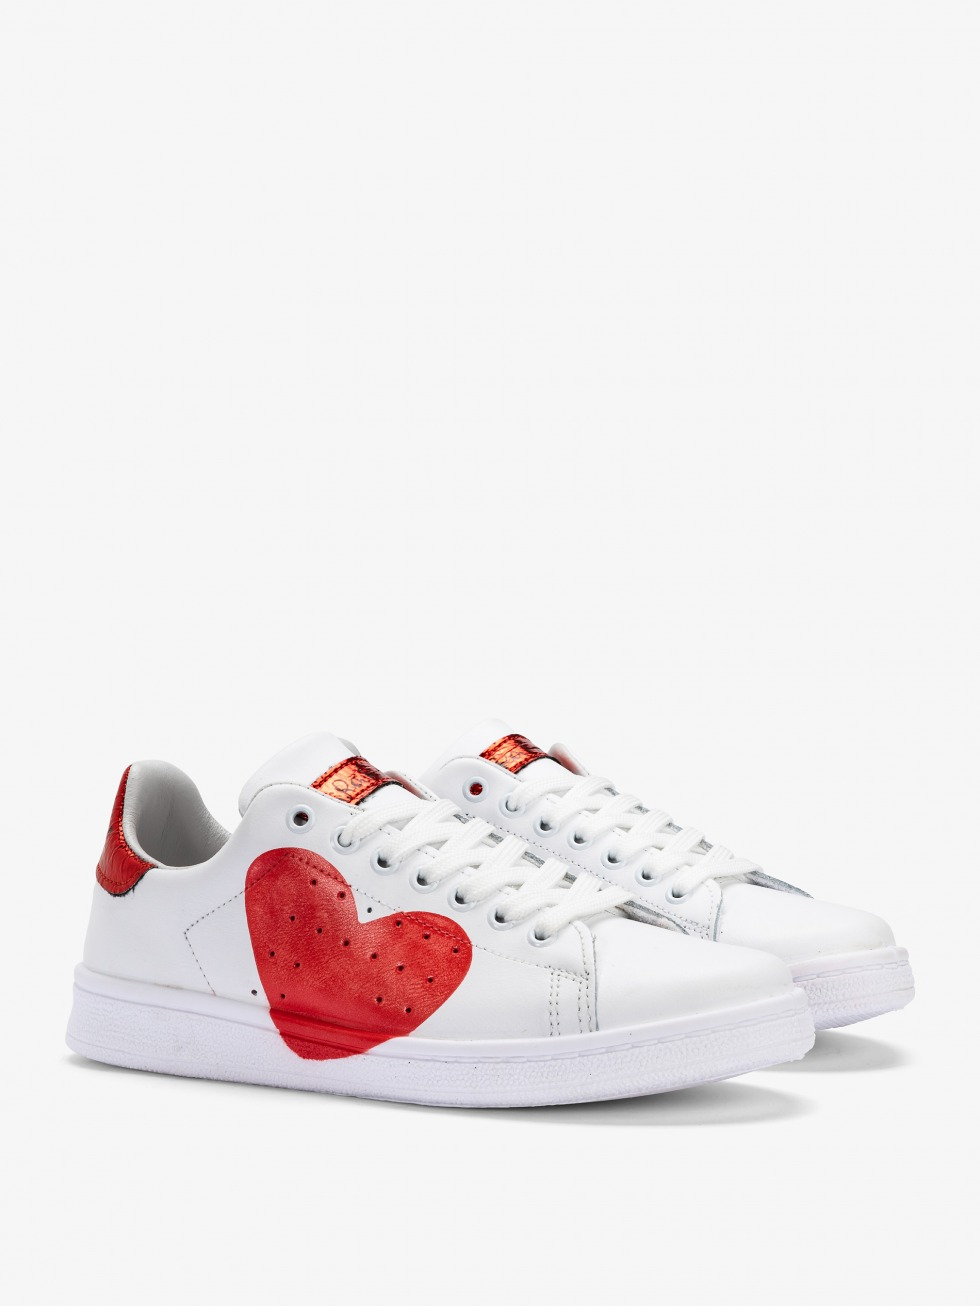 Daiquiri White Sneakers - Space Red Heart